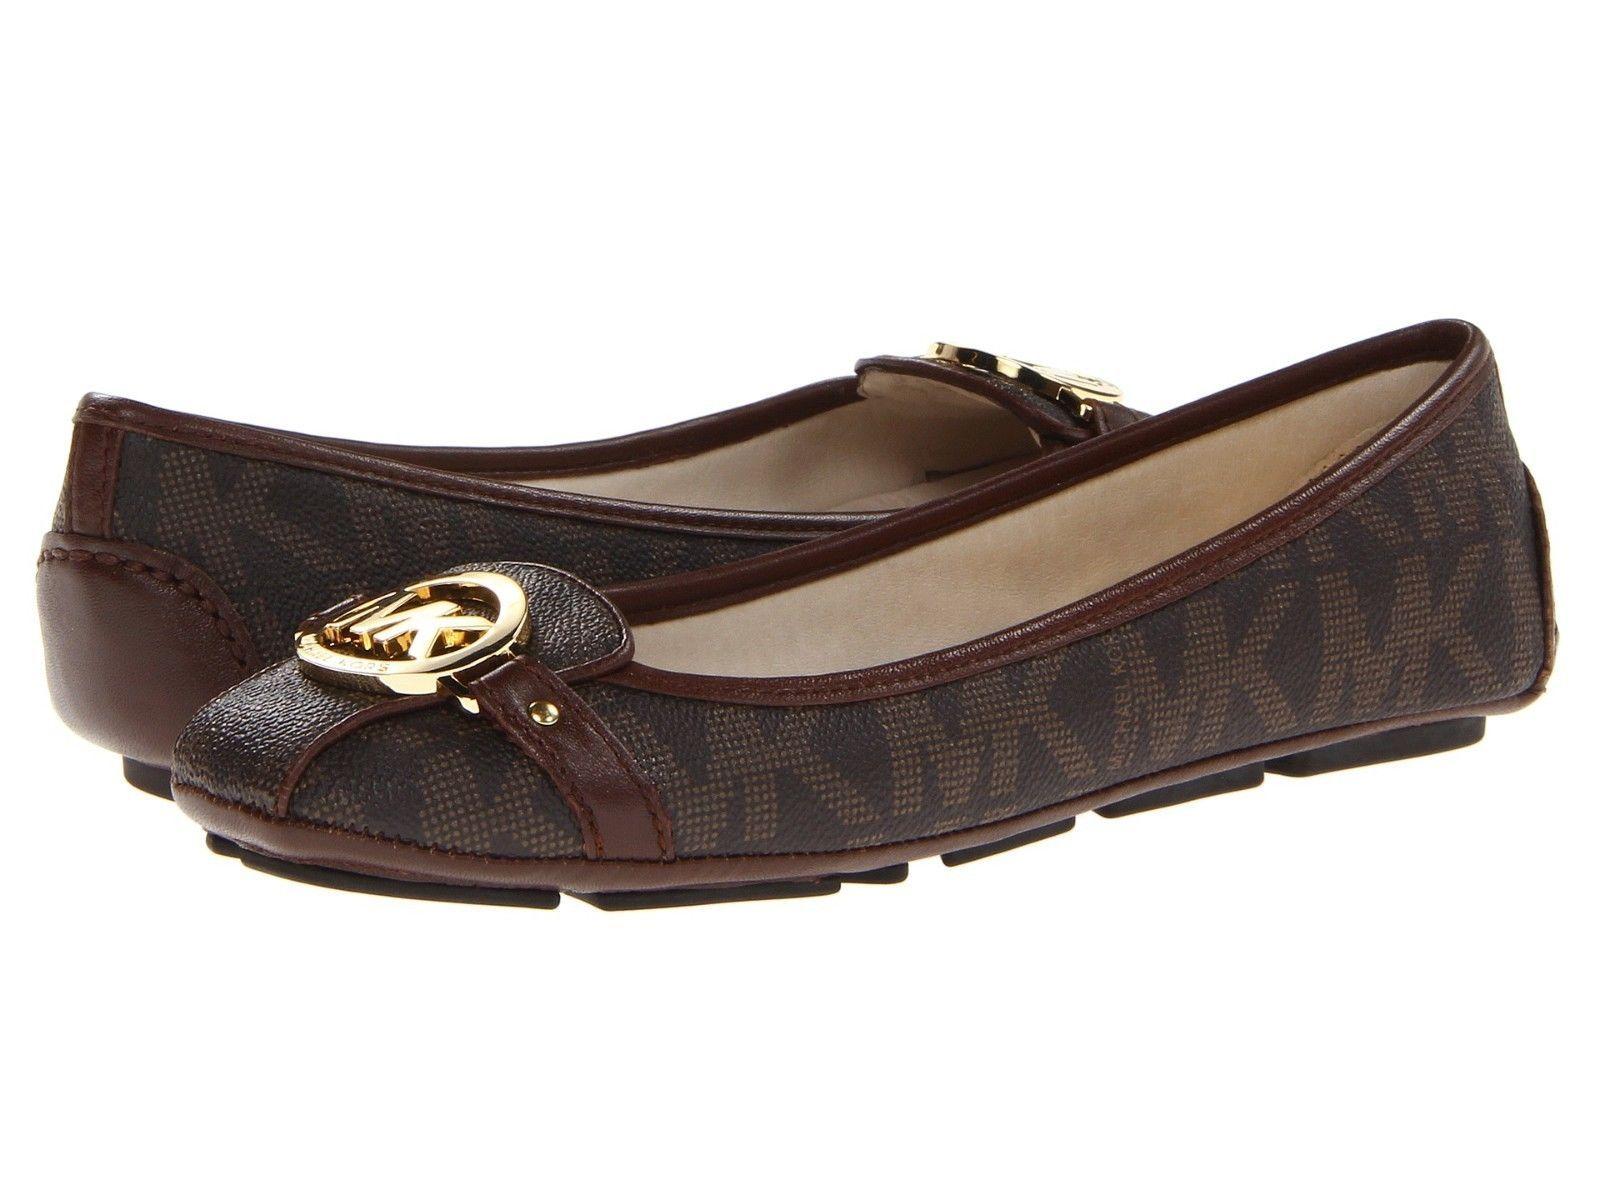 Ballet Flats Ballerina Shoes for Women On Sale, Fulton Moc, Leopard, Fur, 2017, 4 Michael Kors